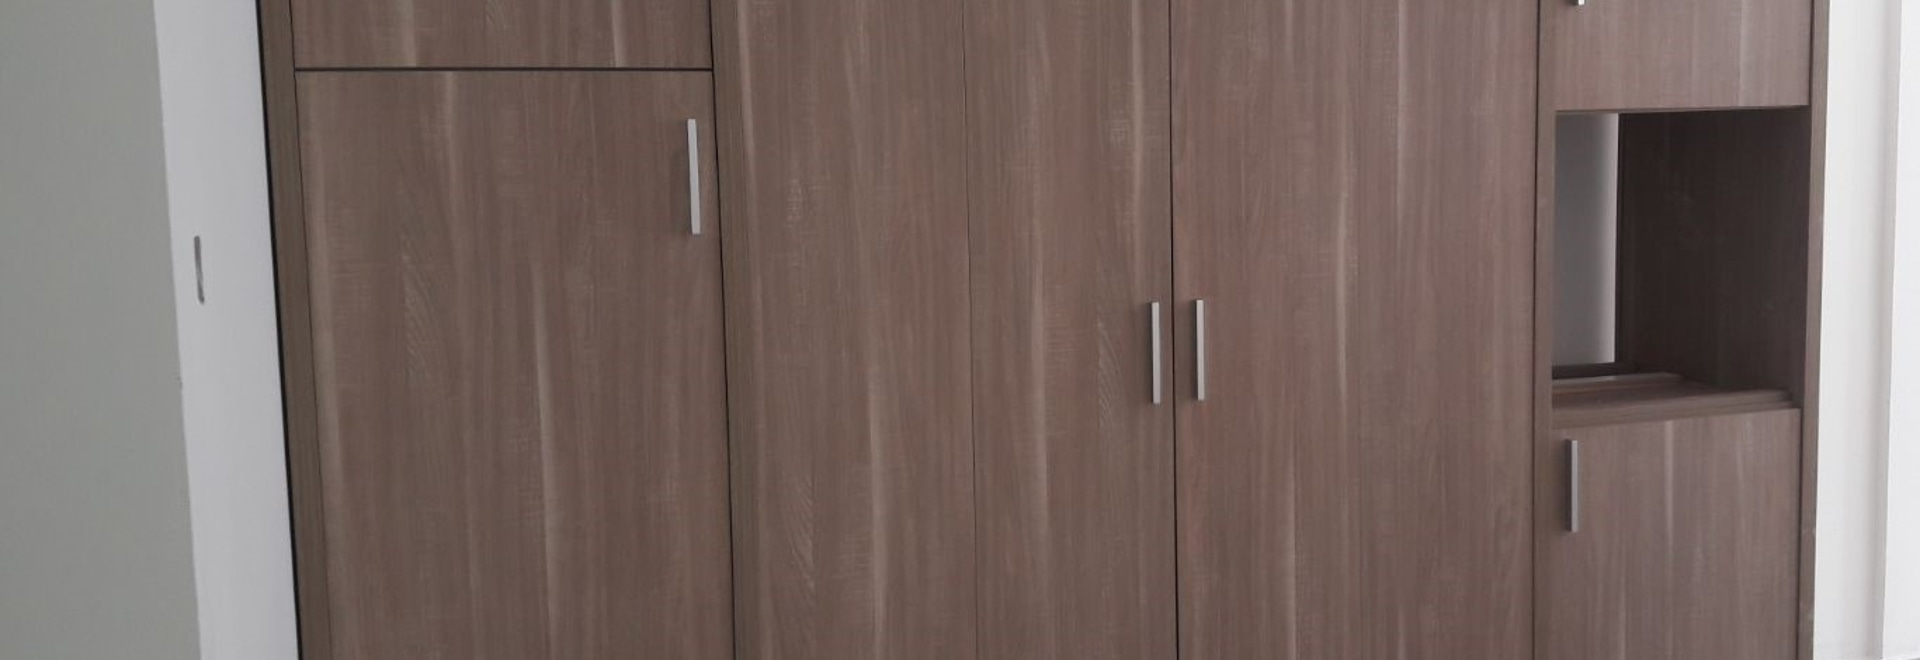 Installed 105 mini kitchens at Shamal Residence Building in Dubai